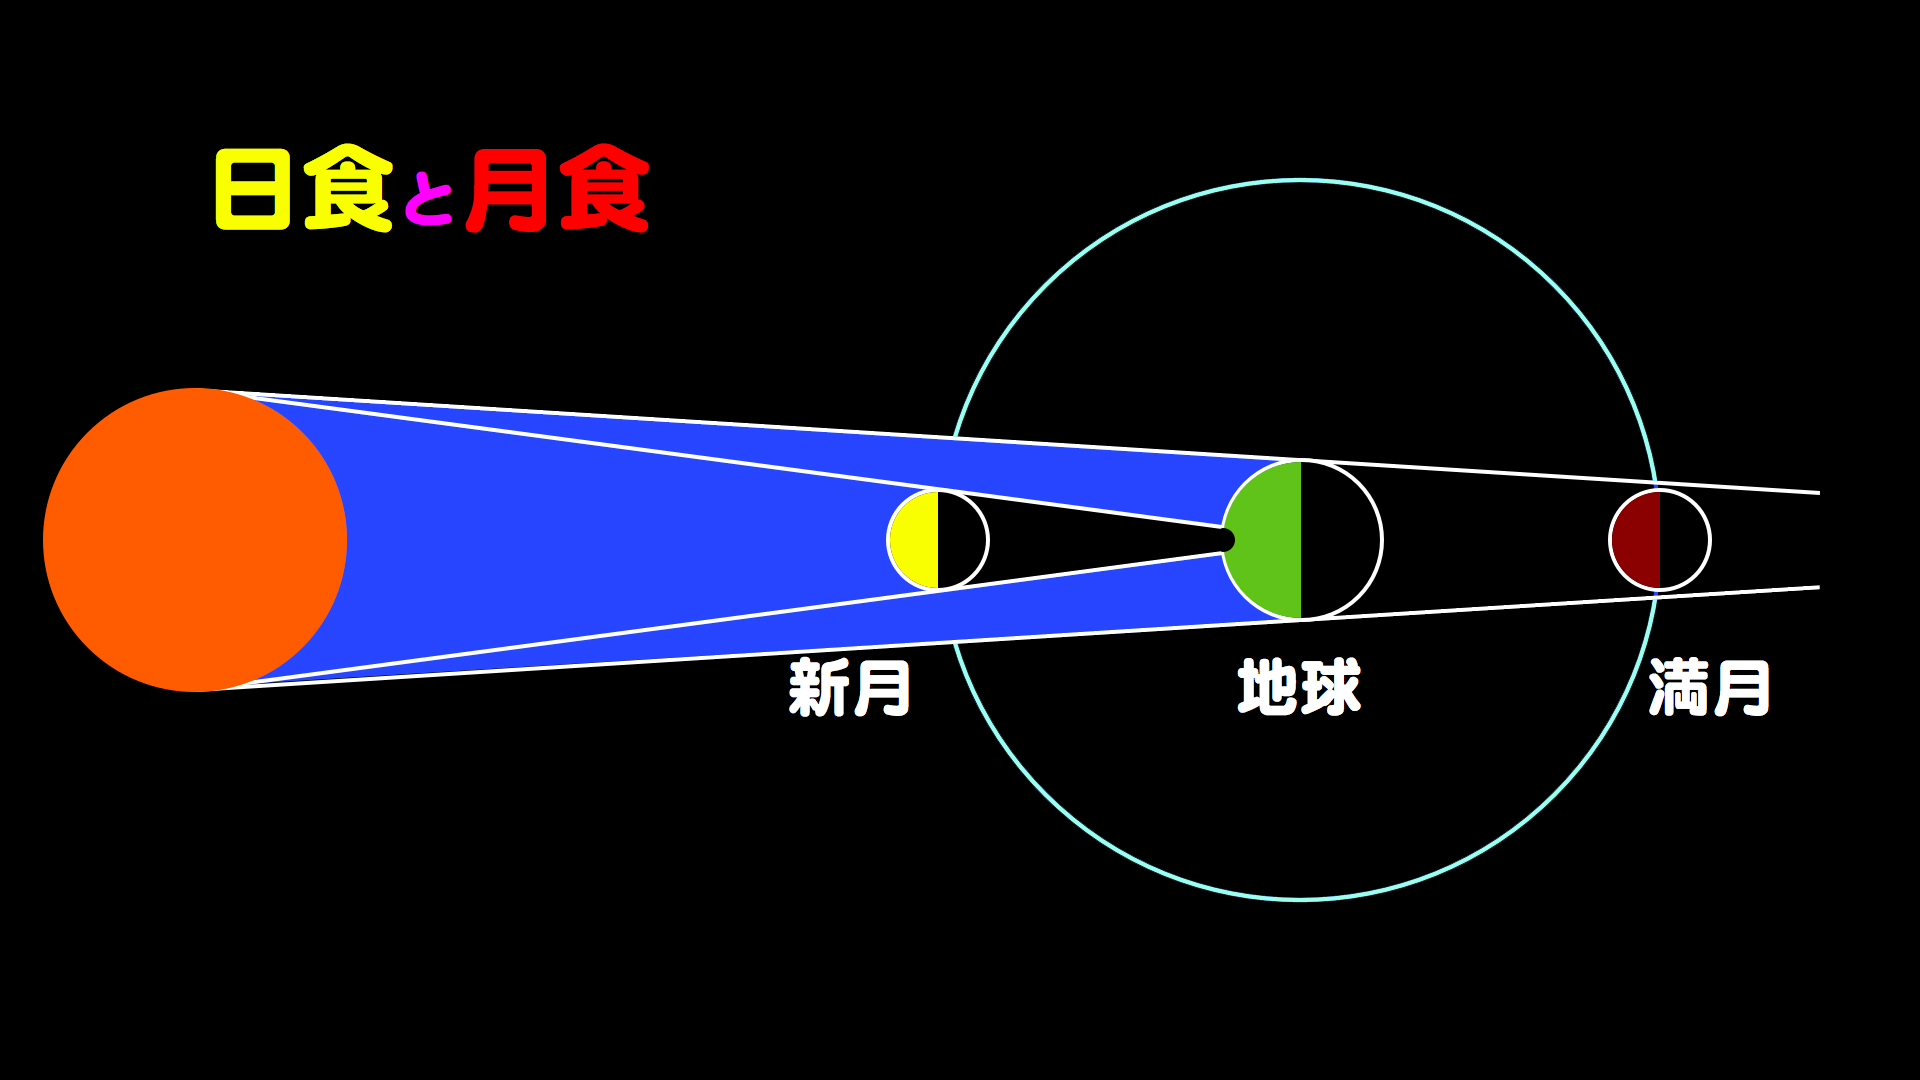 http://www.ncsm.city.nagoya.jp/study/astro/M_12-04IP.019.jpg